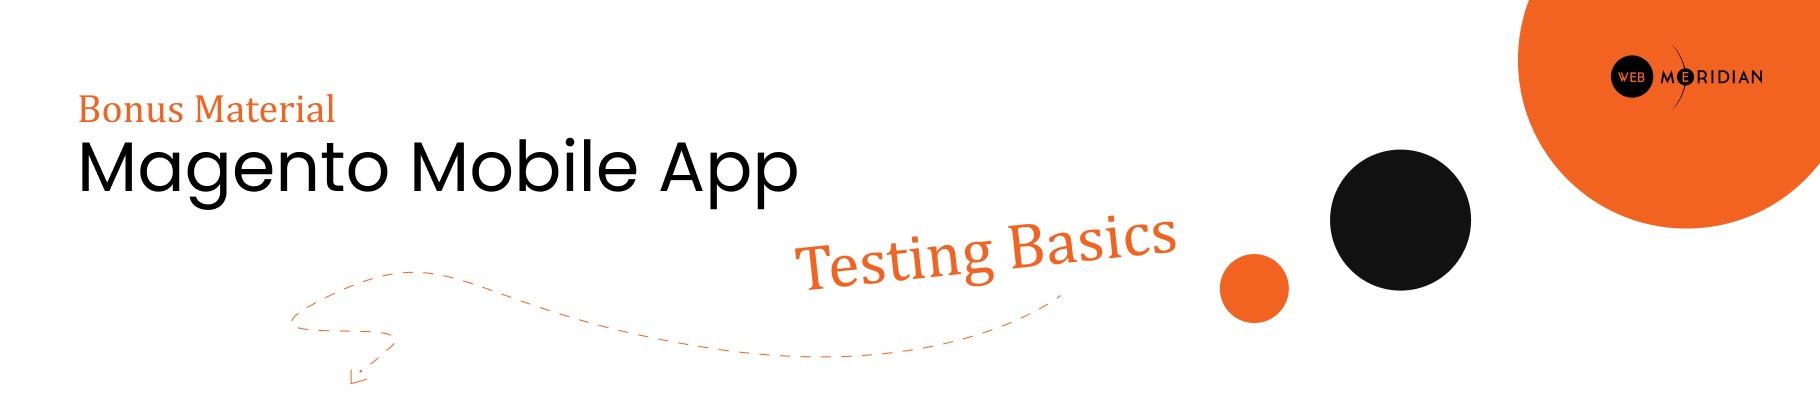 Magento Mobile App Testing Basics